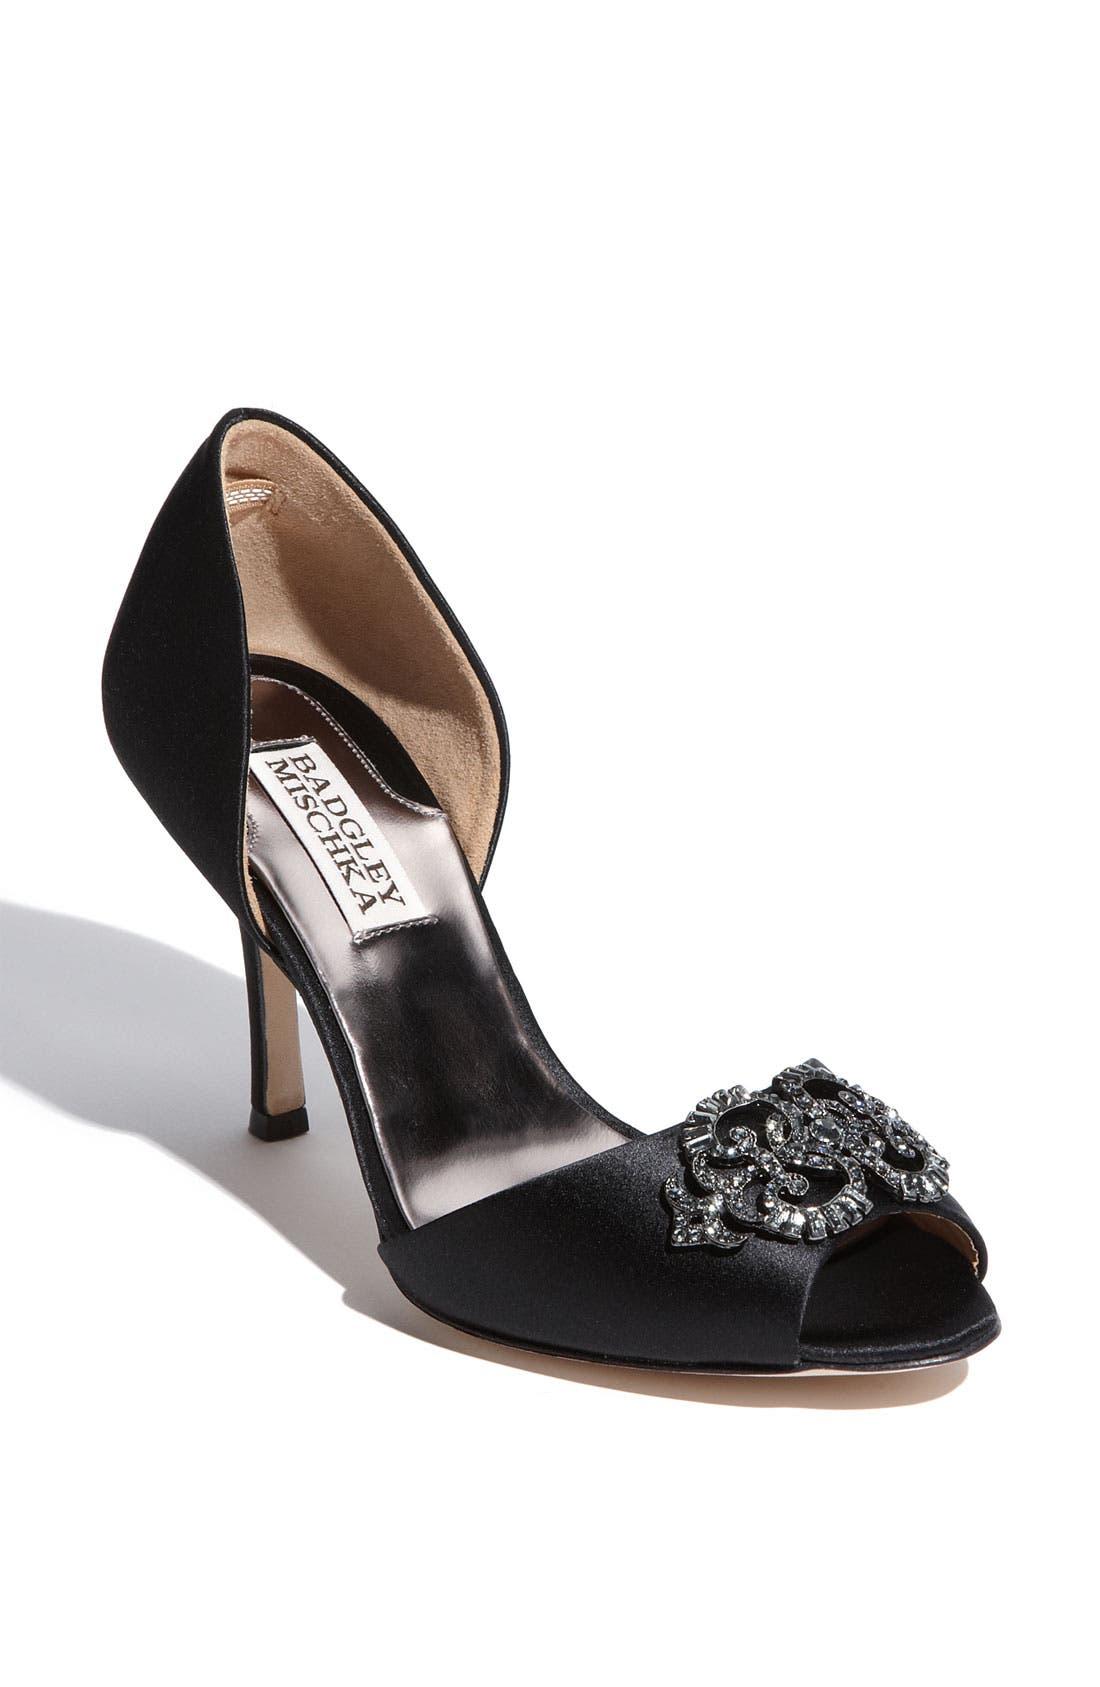 Badgley mischka salsa shoes